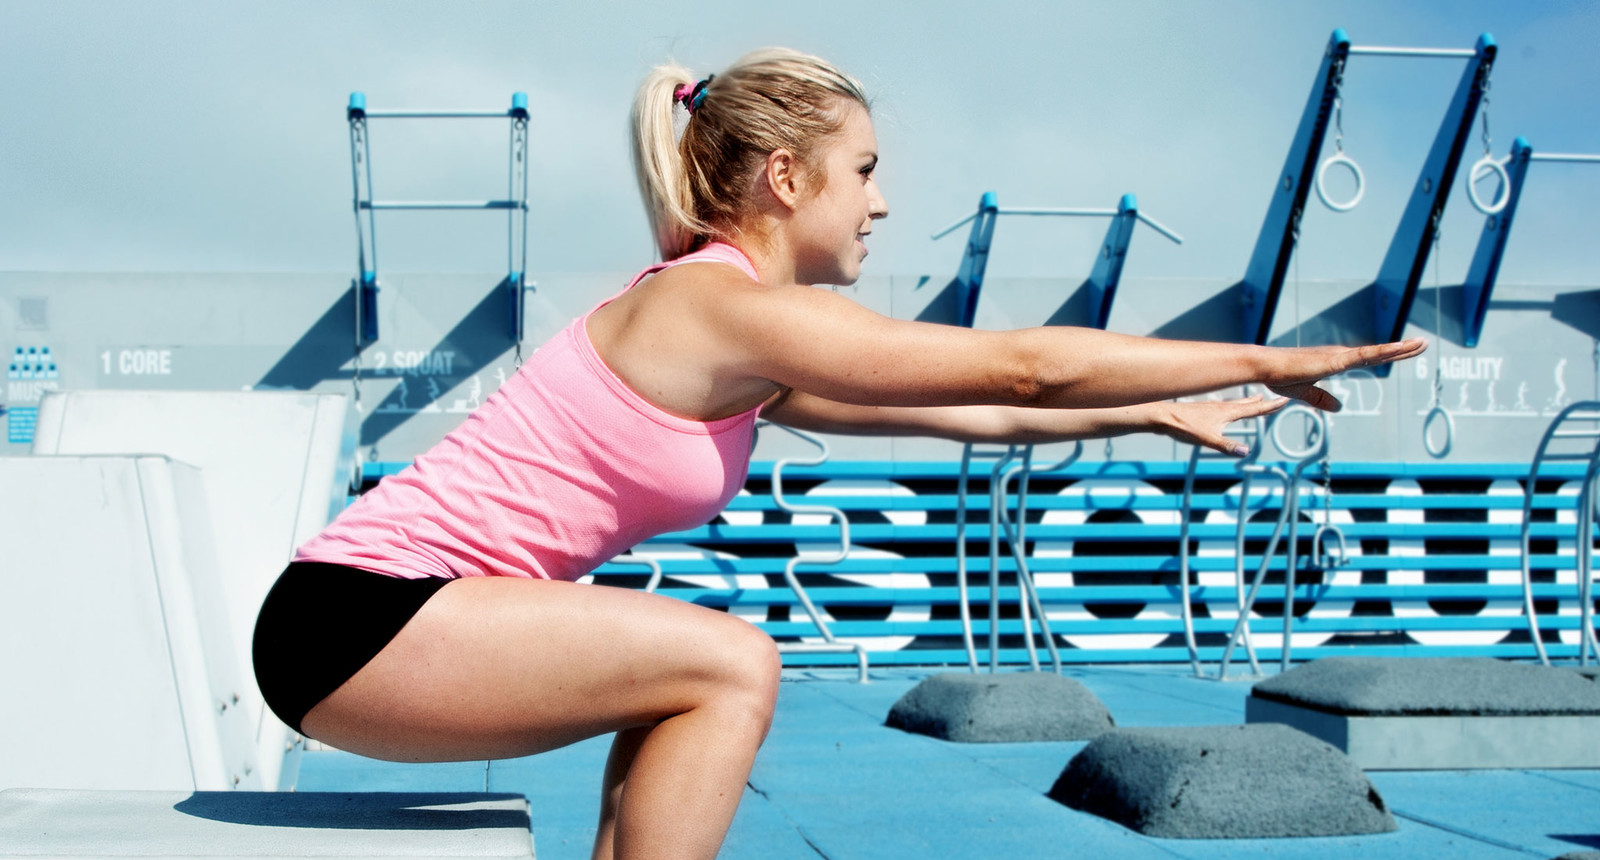 Copy of Fitness court 1.jpg